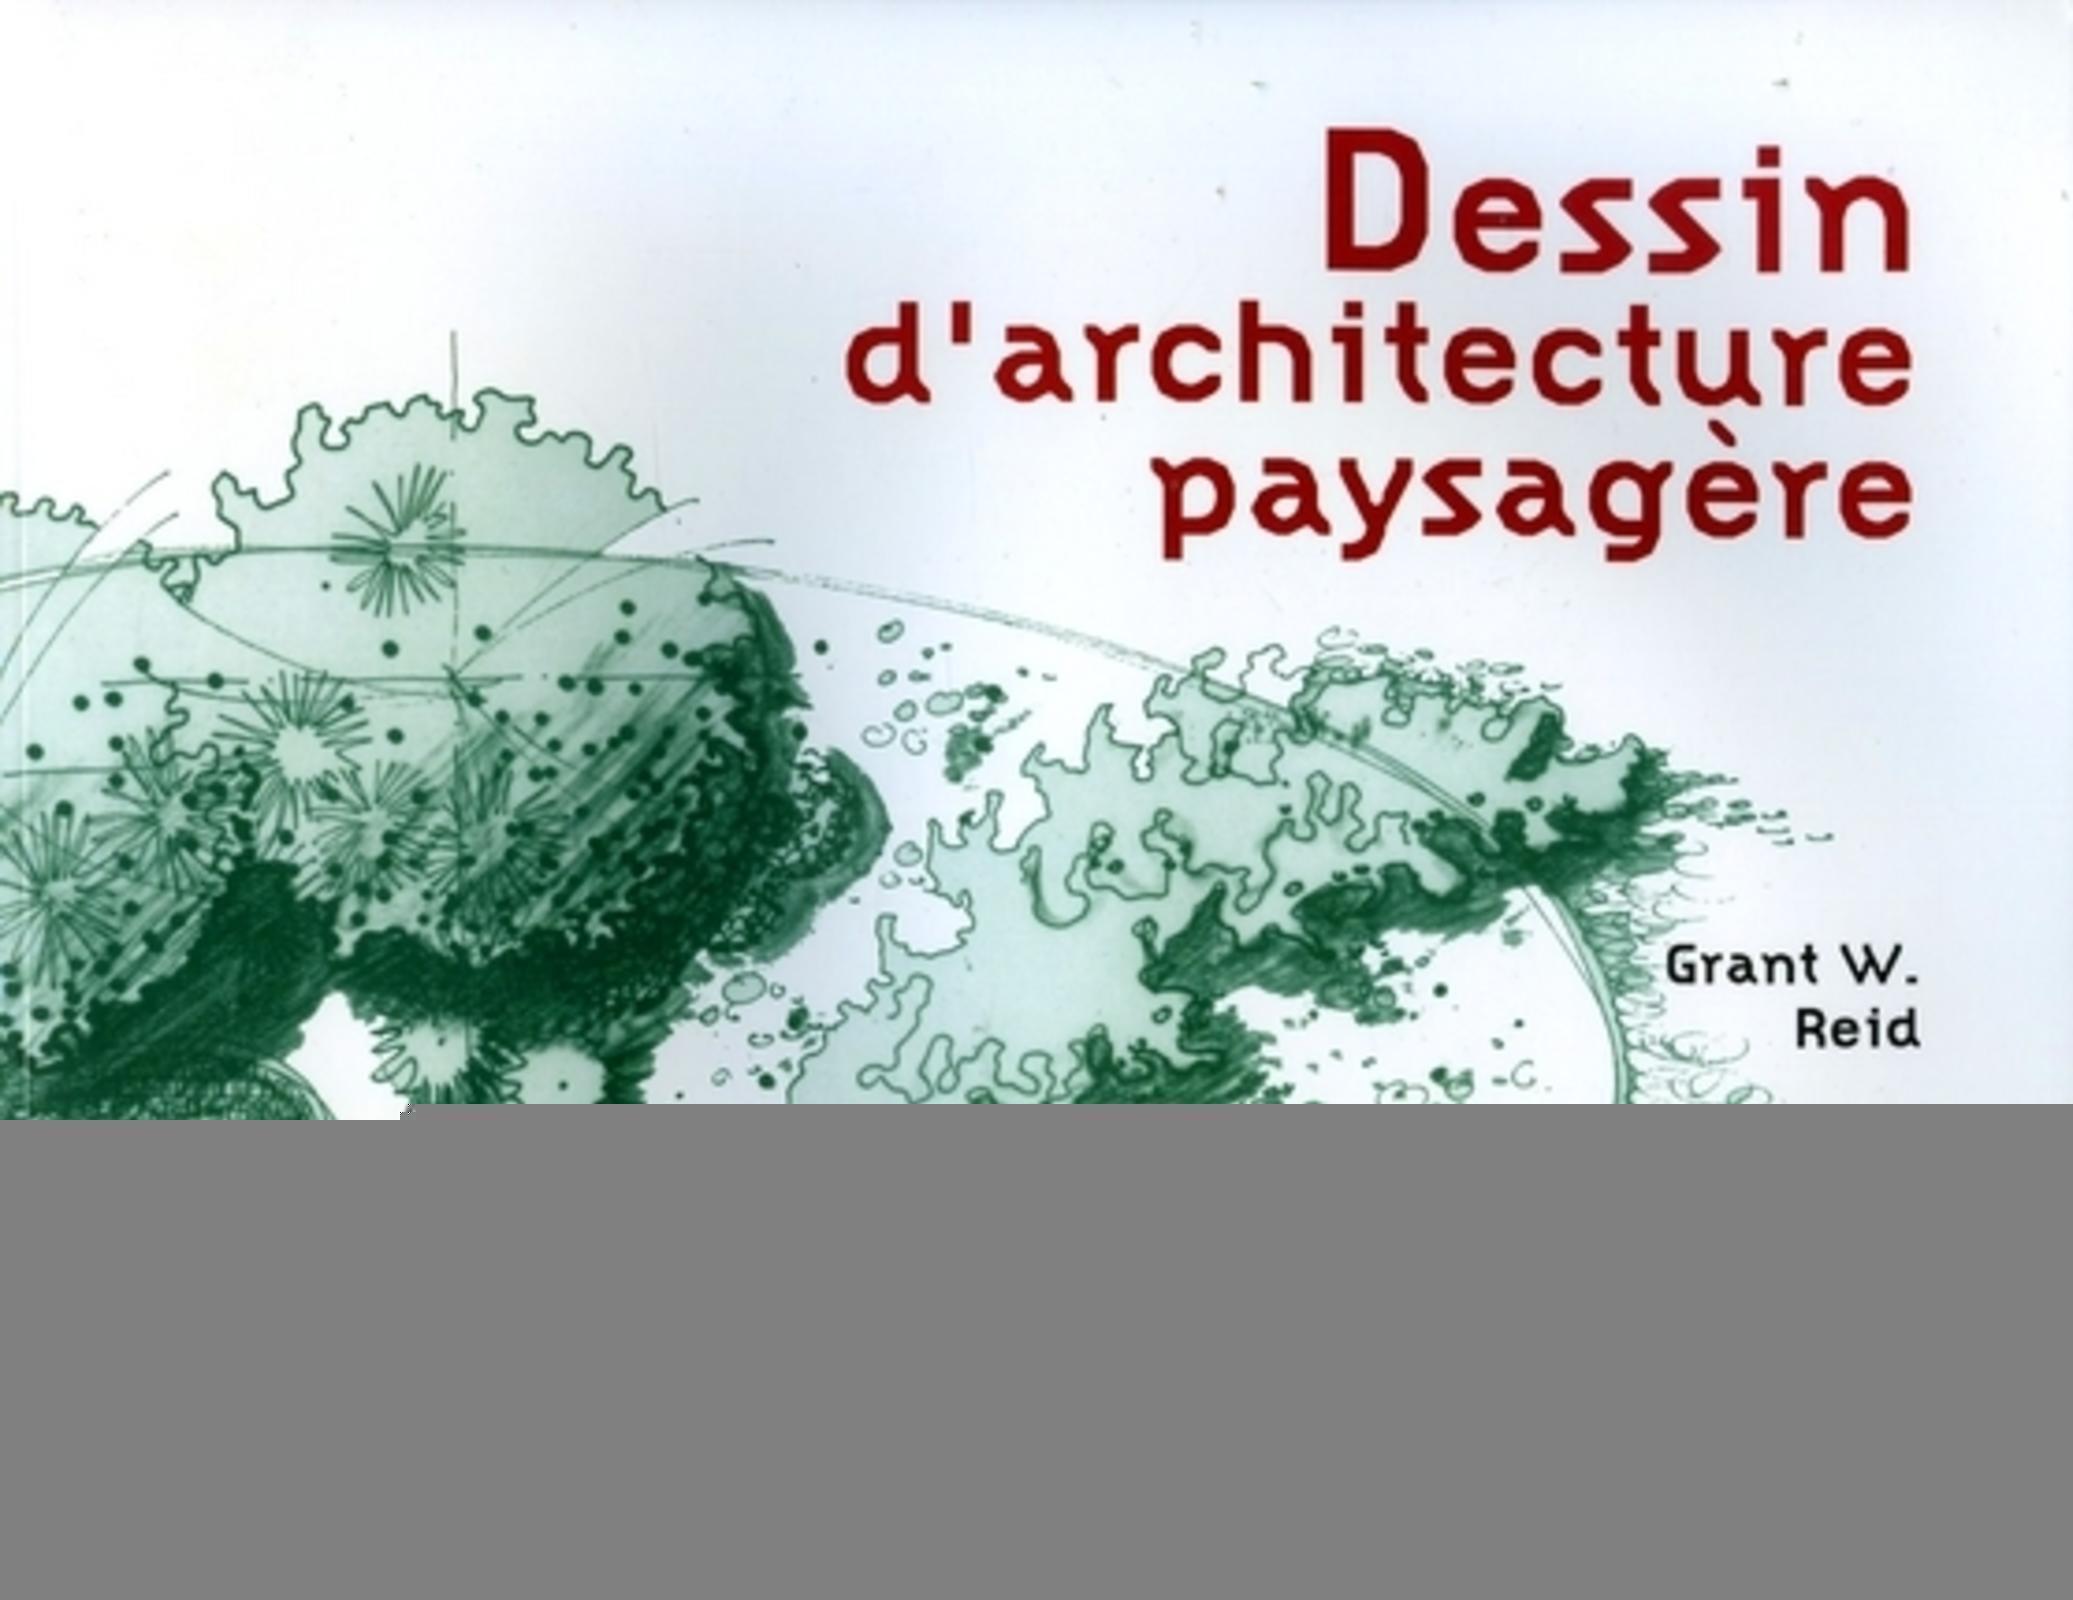 DESSIN D'ARCHITECTURE PAYSAGERE